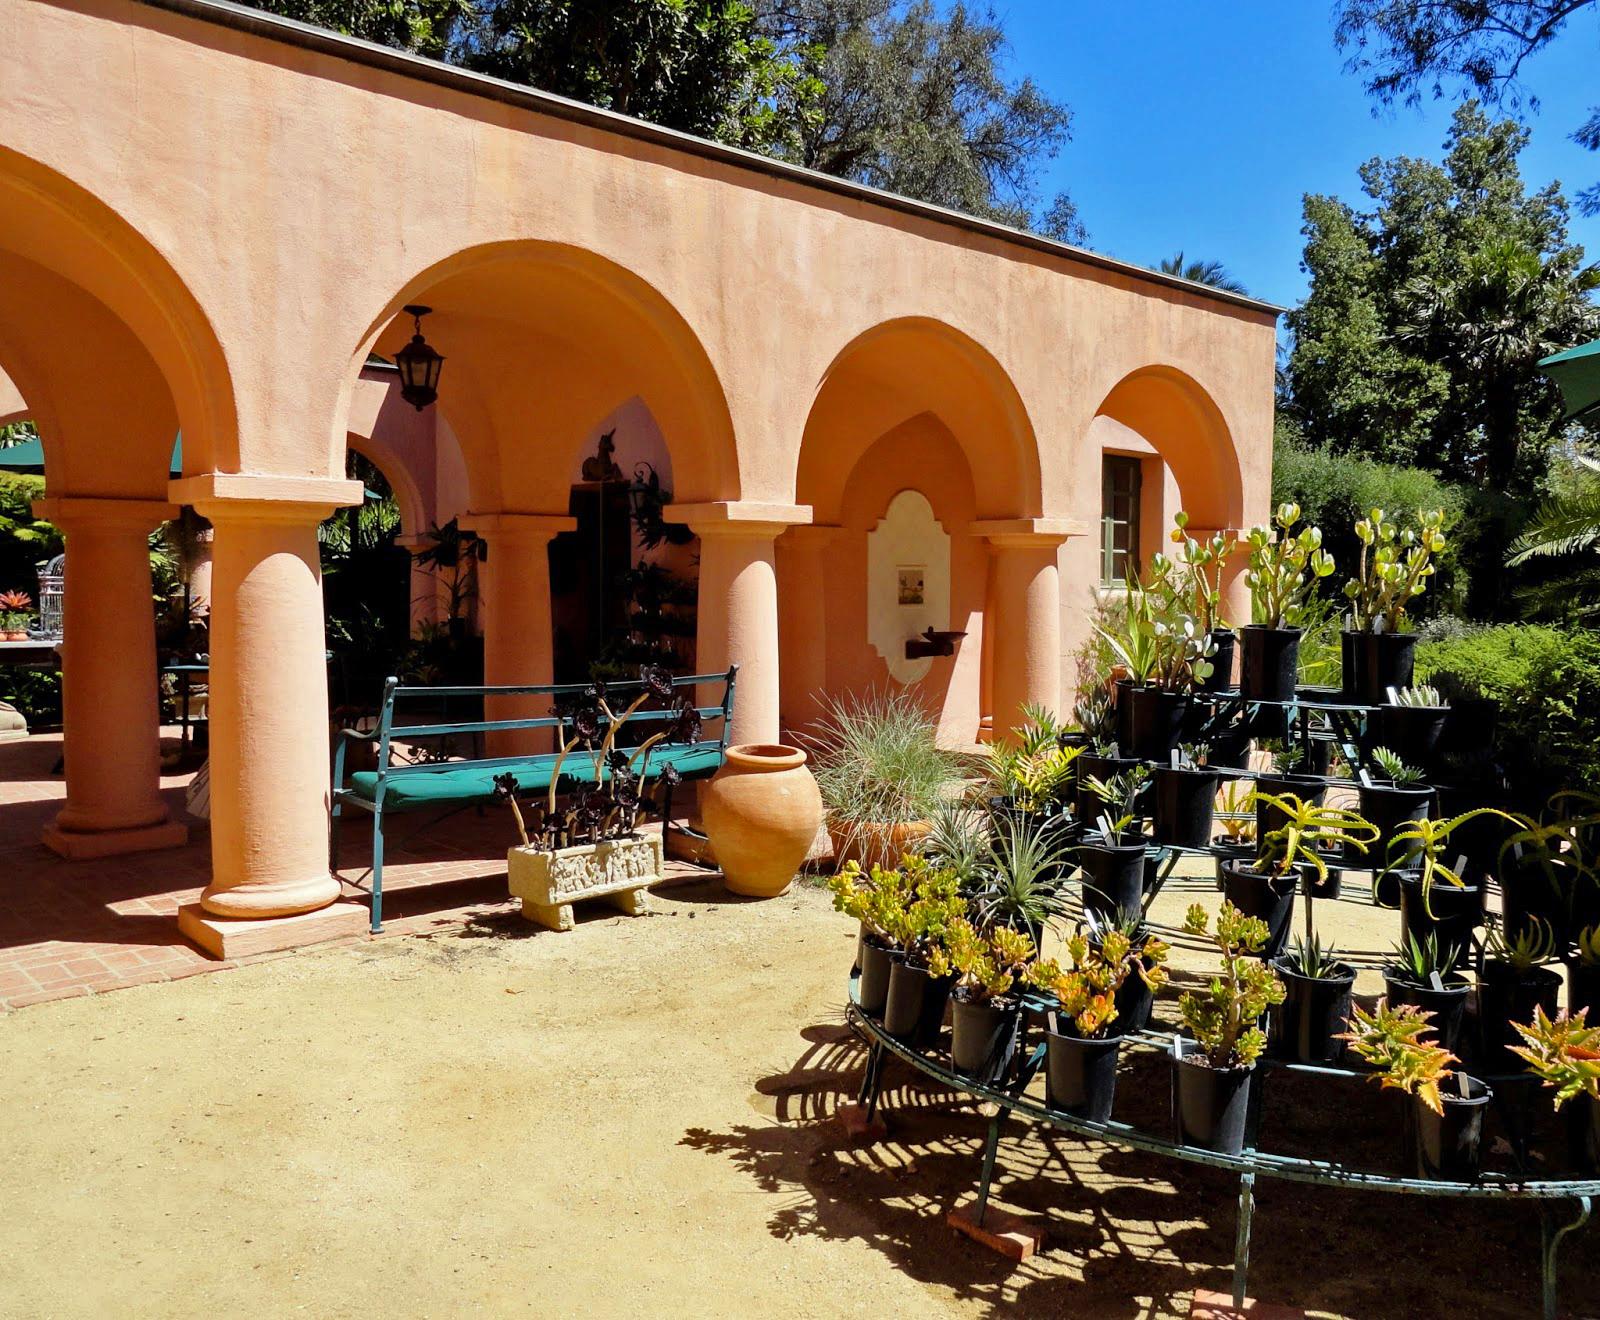 Lotusland Visitors Center, Montecito, California - VISITORS CENTER FOR THE LOTUSLAND BOTANIC GARDEN